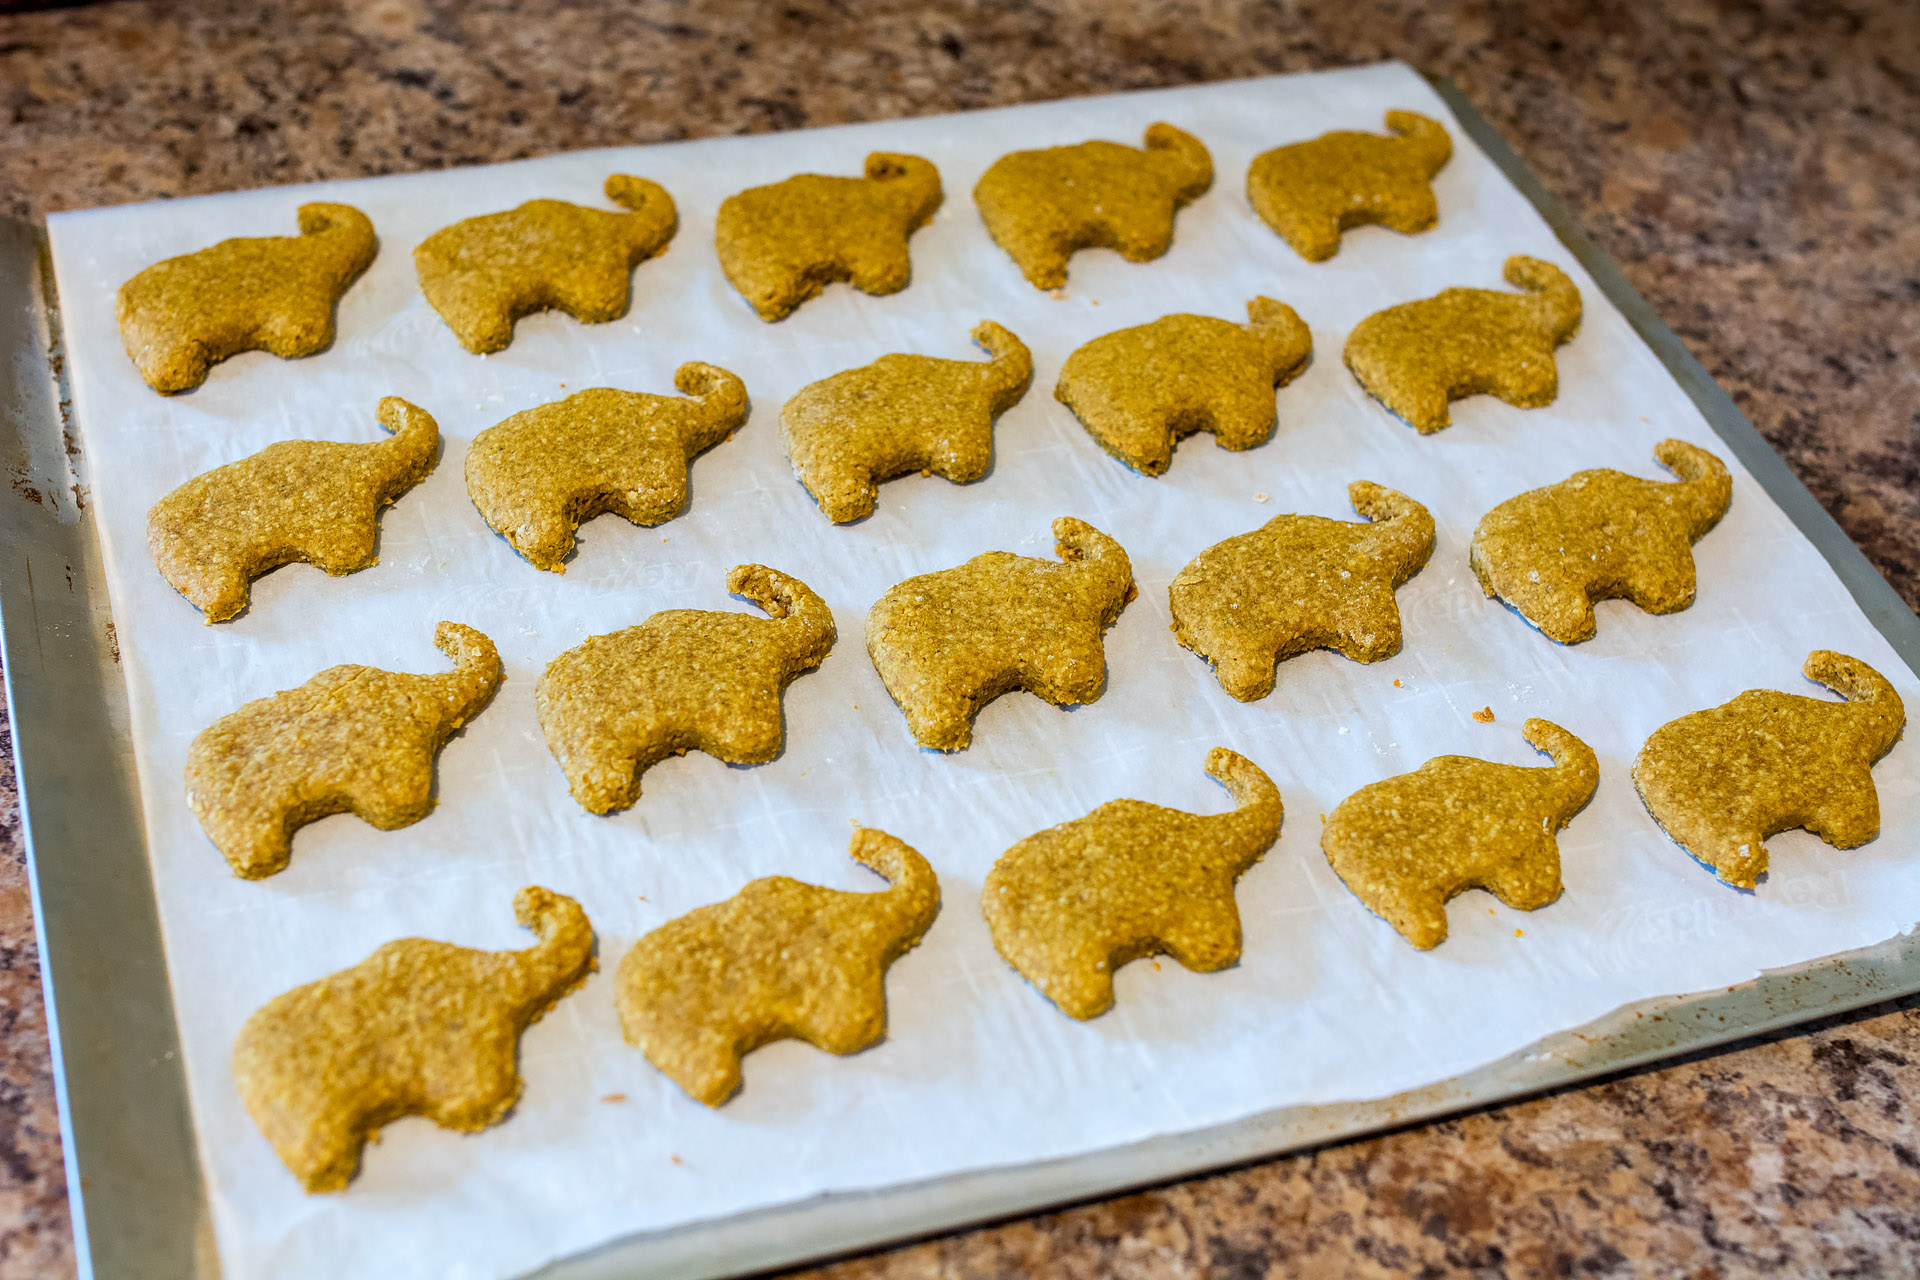 Homemade elephant-shaped doggy treats